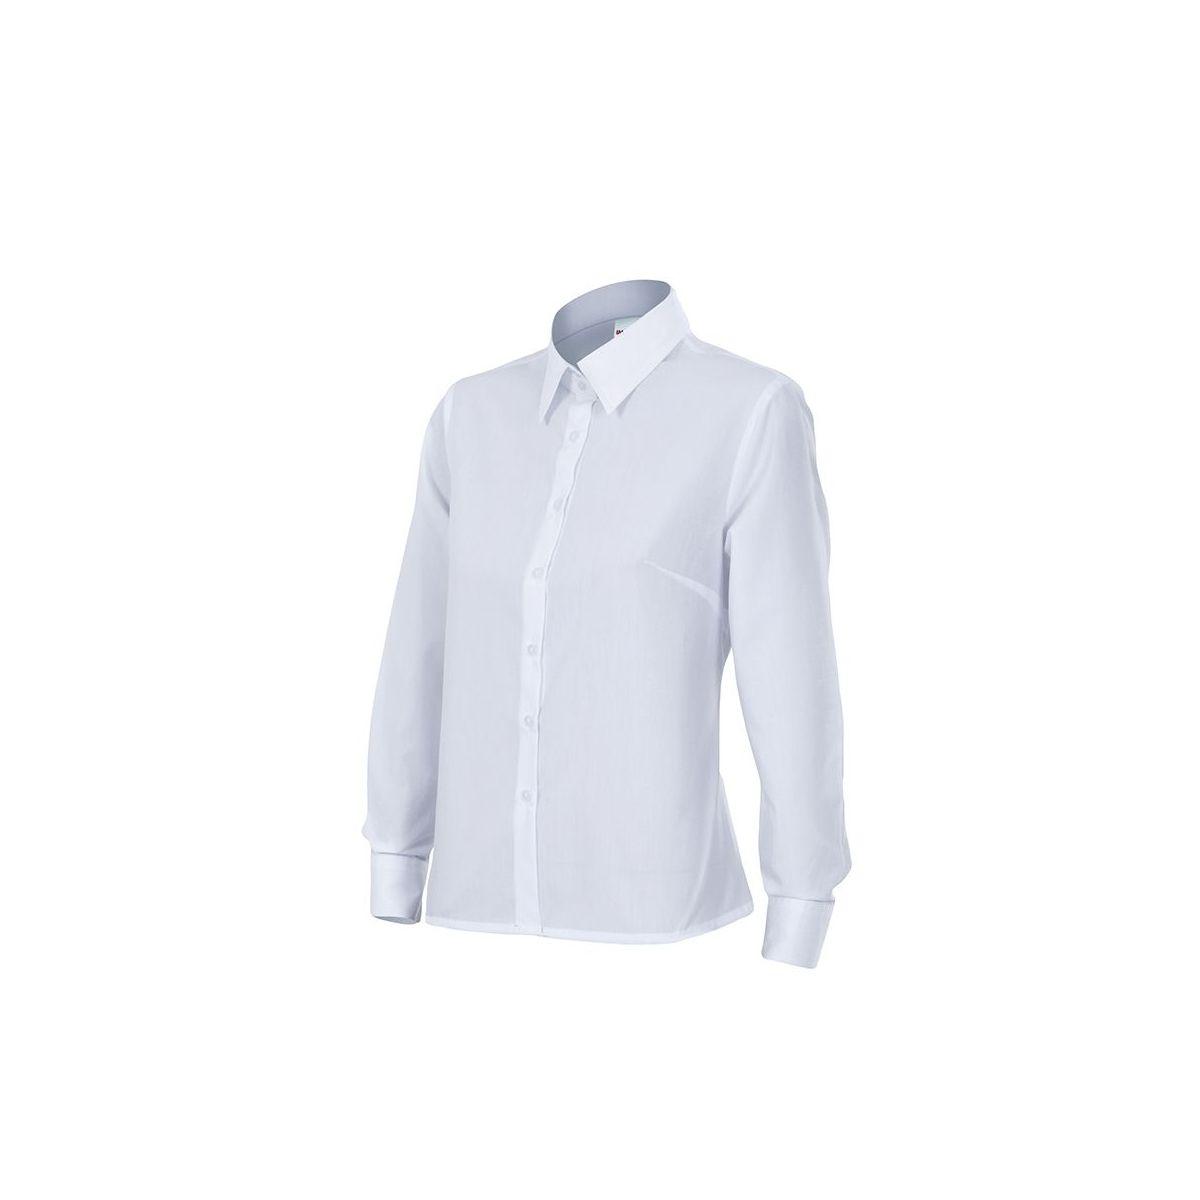 Camisa mujer manga larga (ref: 539, varias tallas disponibles)